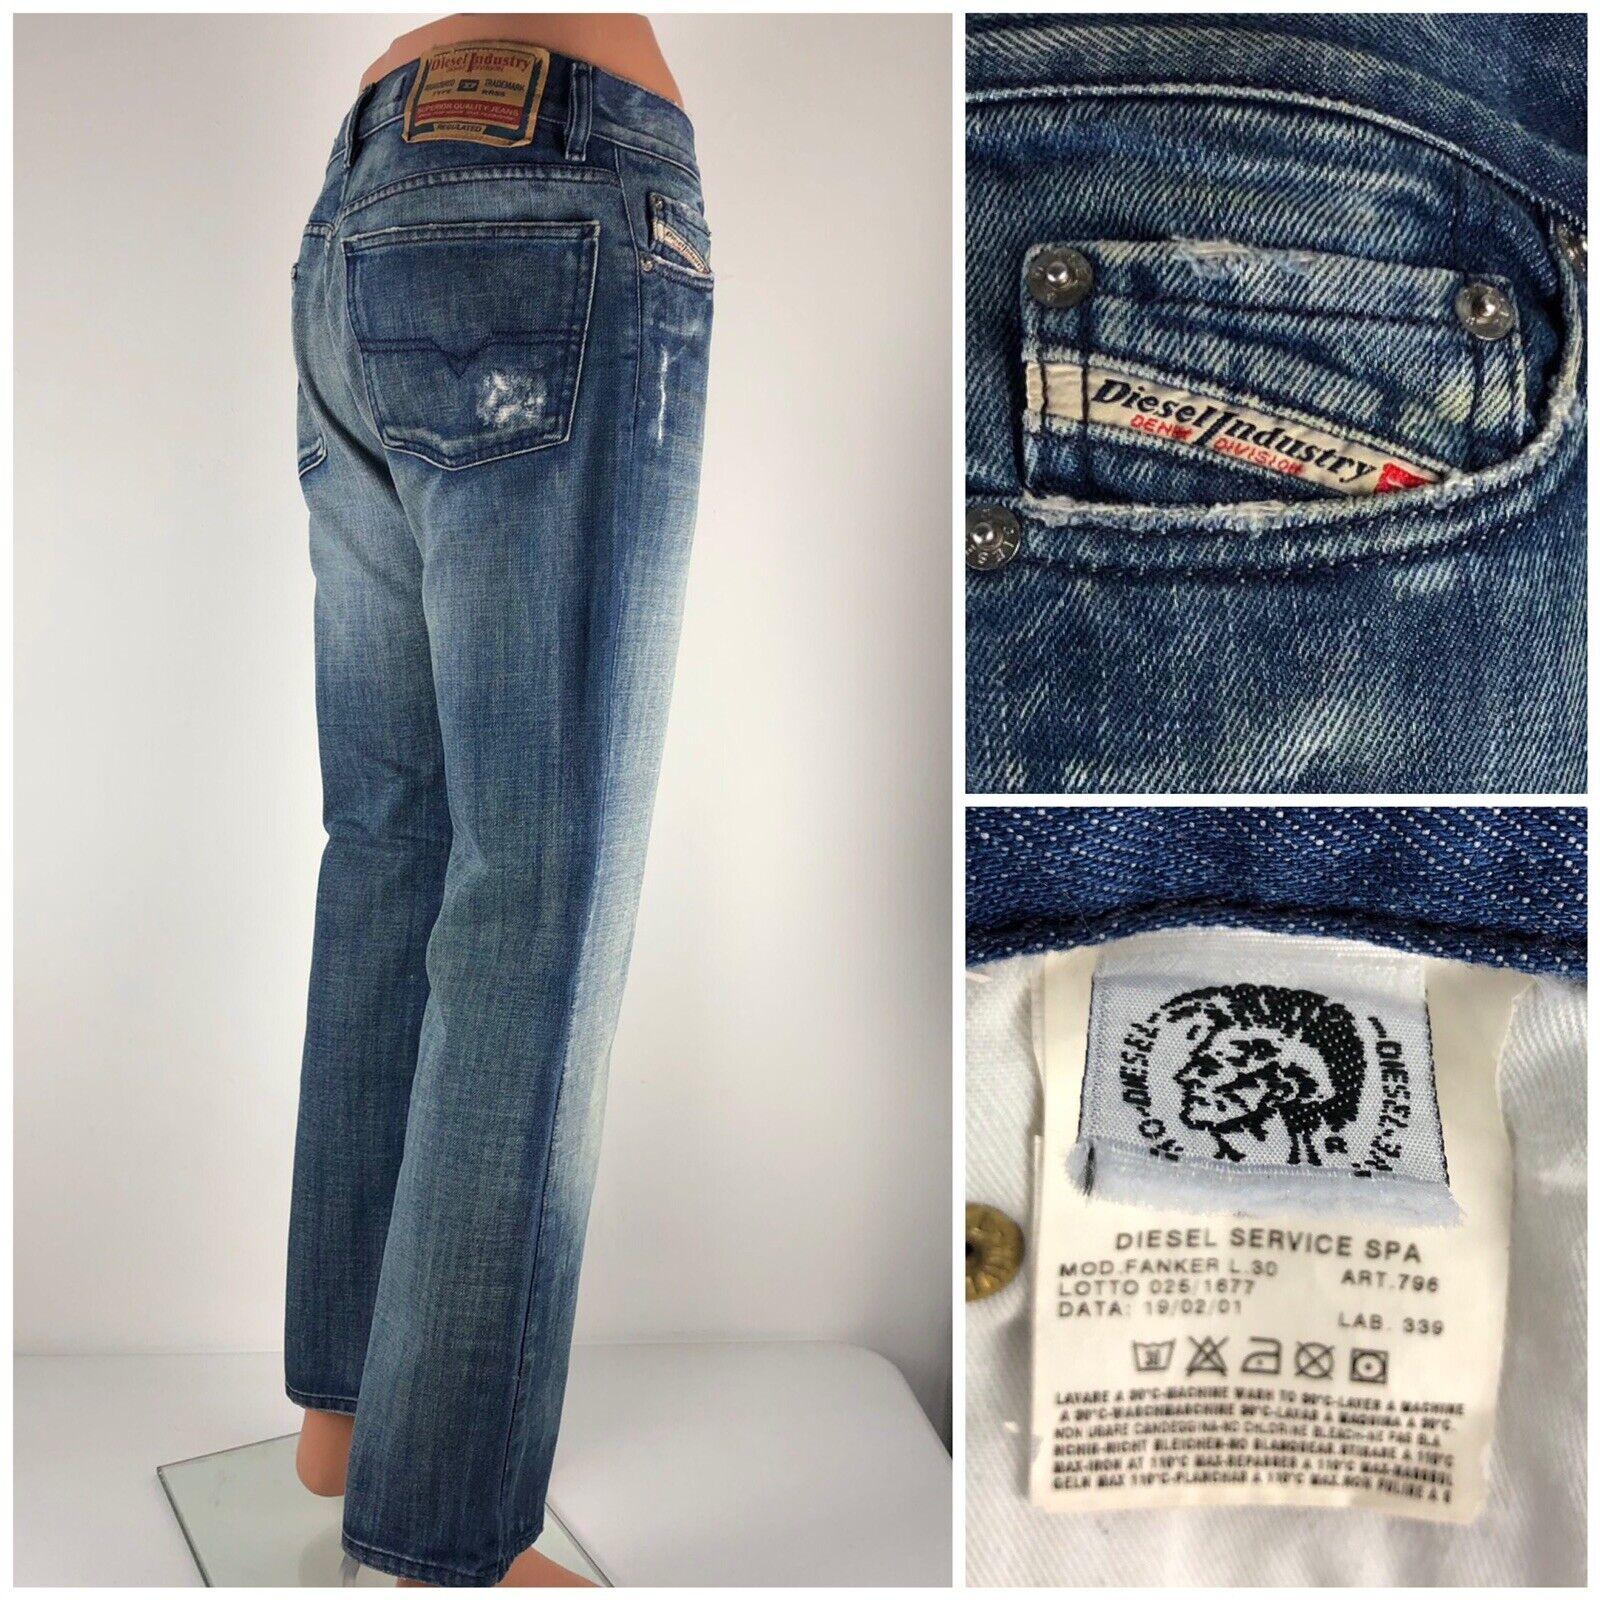 Diesel Fanker Mens 30 X 30 Jeans Distressed Faded 100% Cotton Vintage